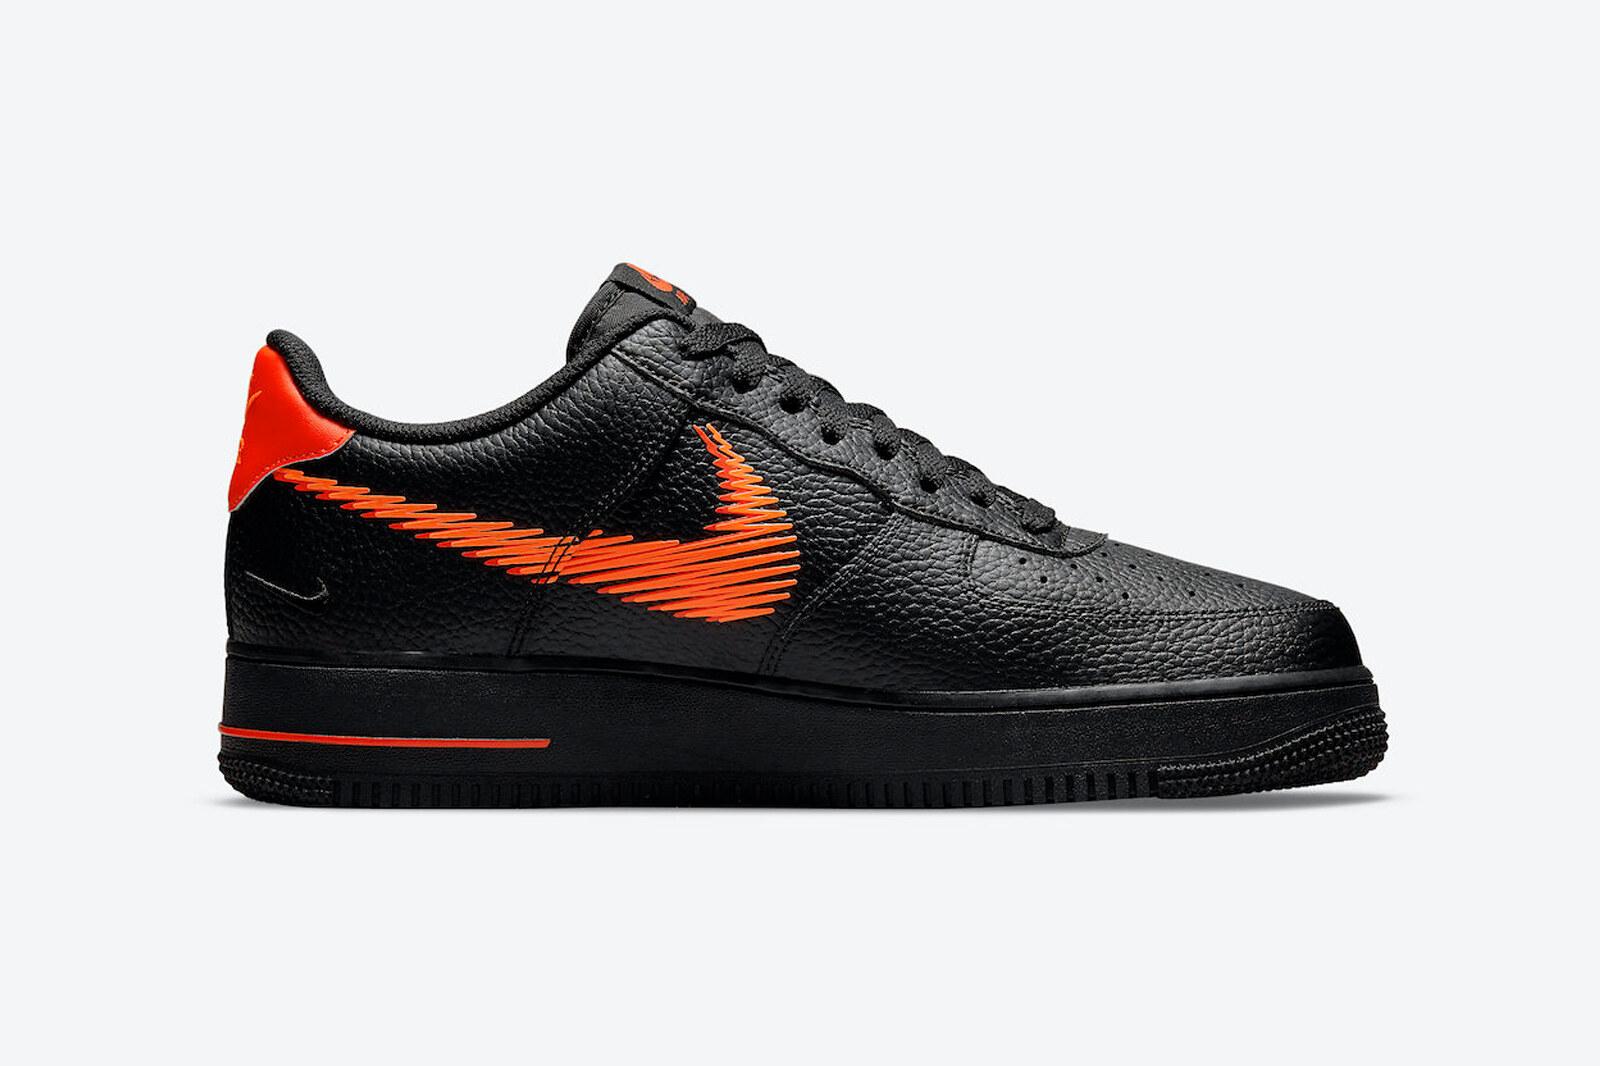 Nike Air Force 1 Low Zig-Zag VLONE